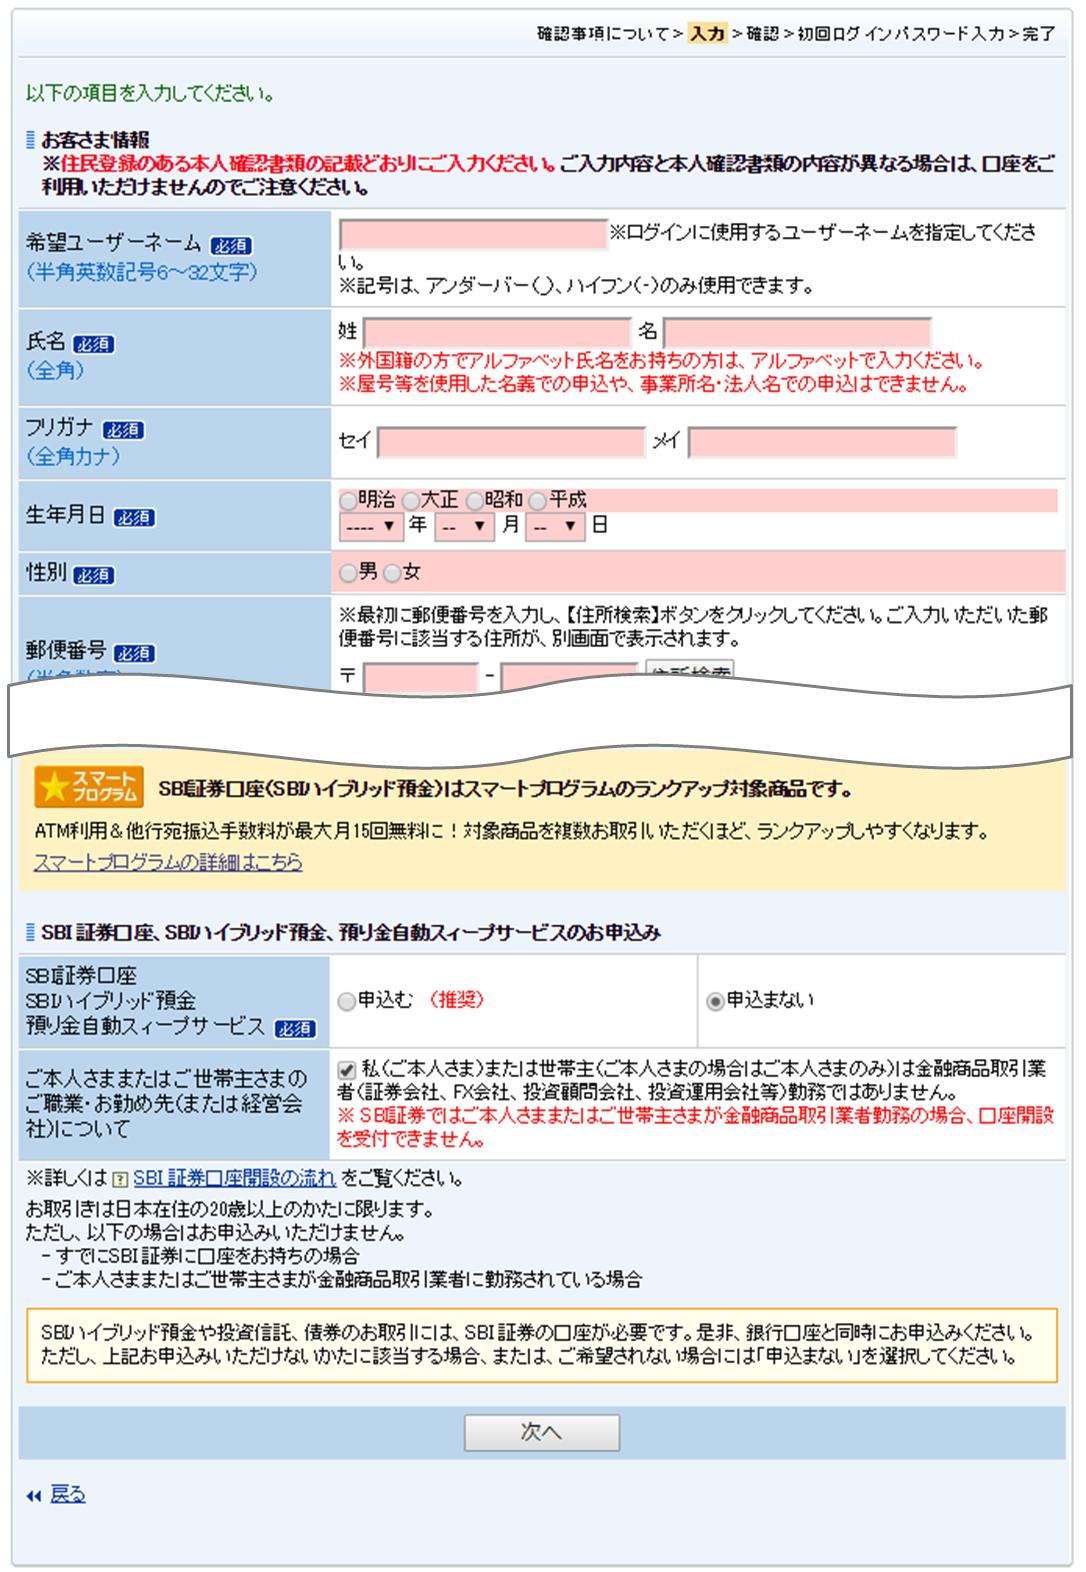 口座開設 _申込入力|住信SBIネット銀行